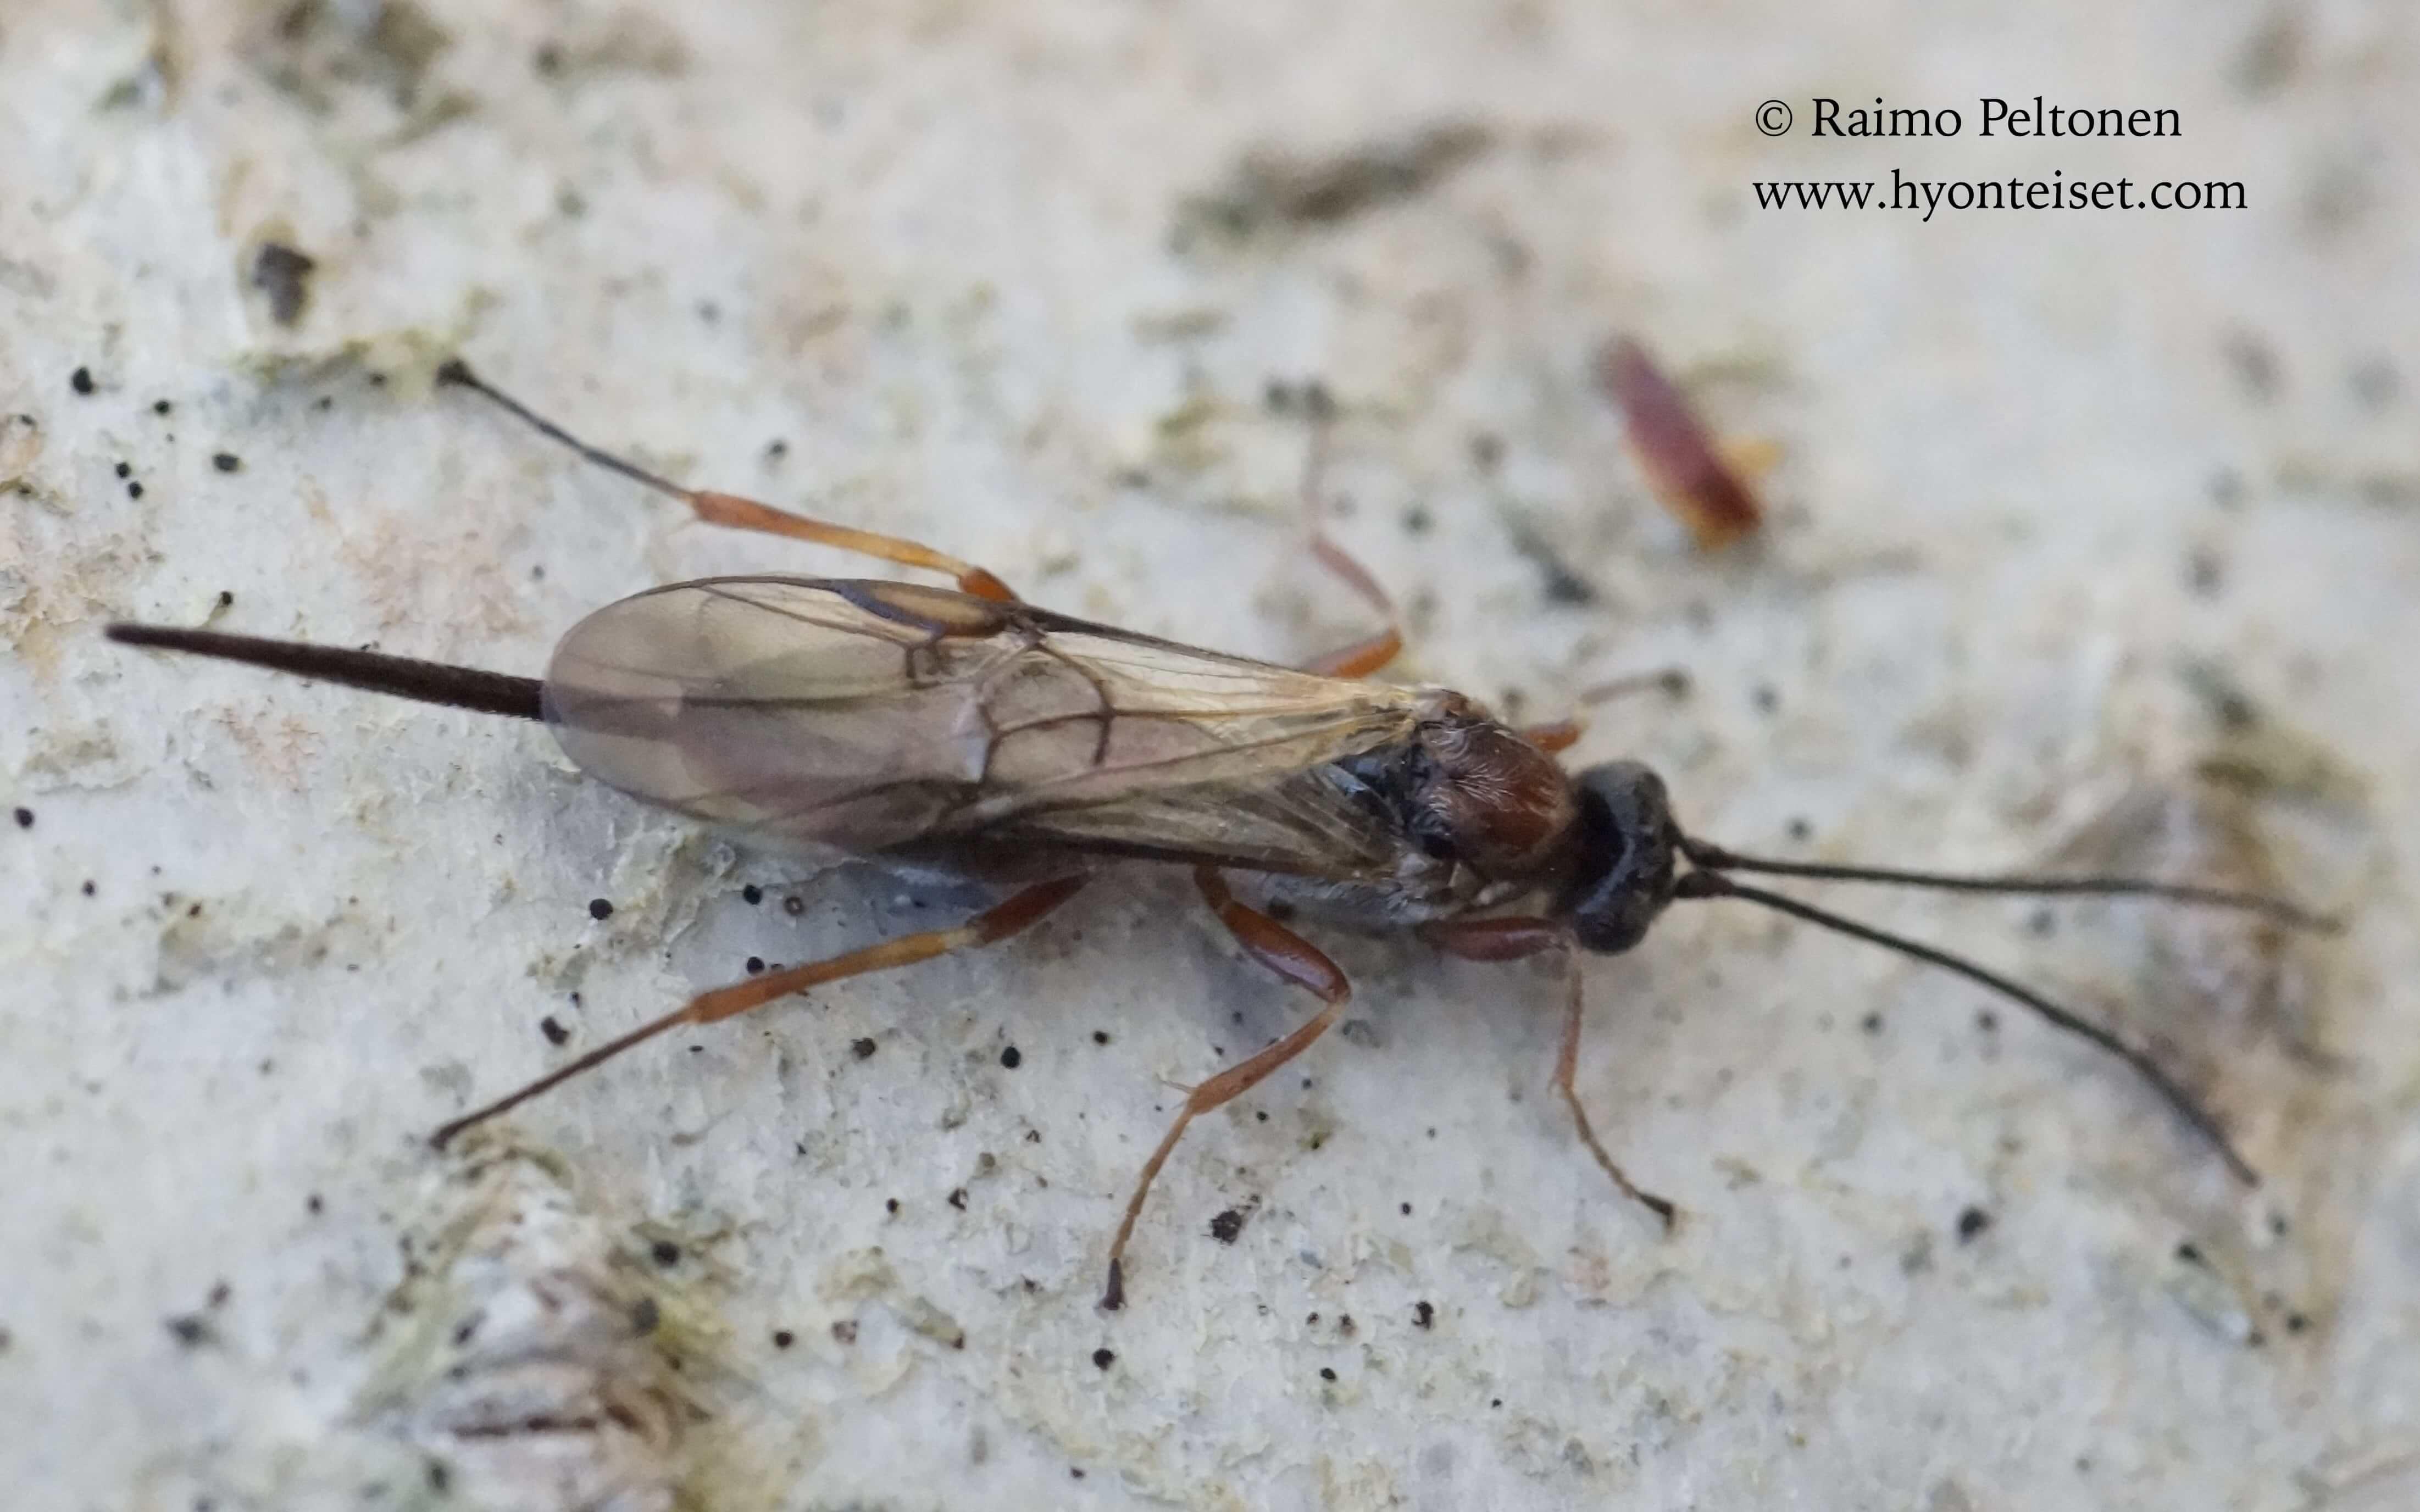 Agathinae sp. (det. Gergely Varkonyi), 7.5.2017 Jyväskylä